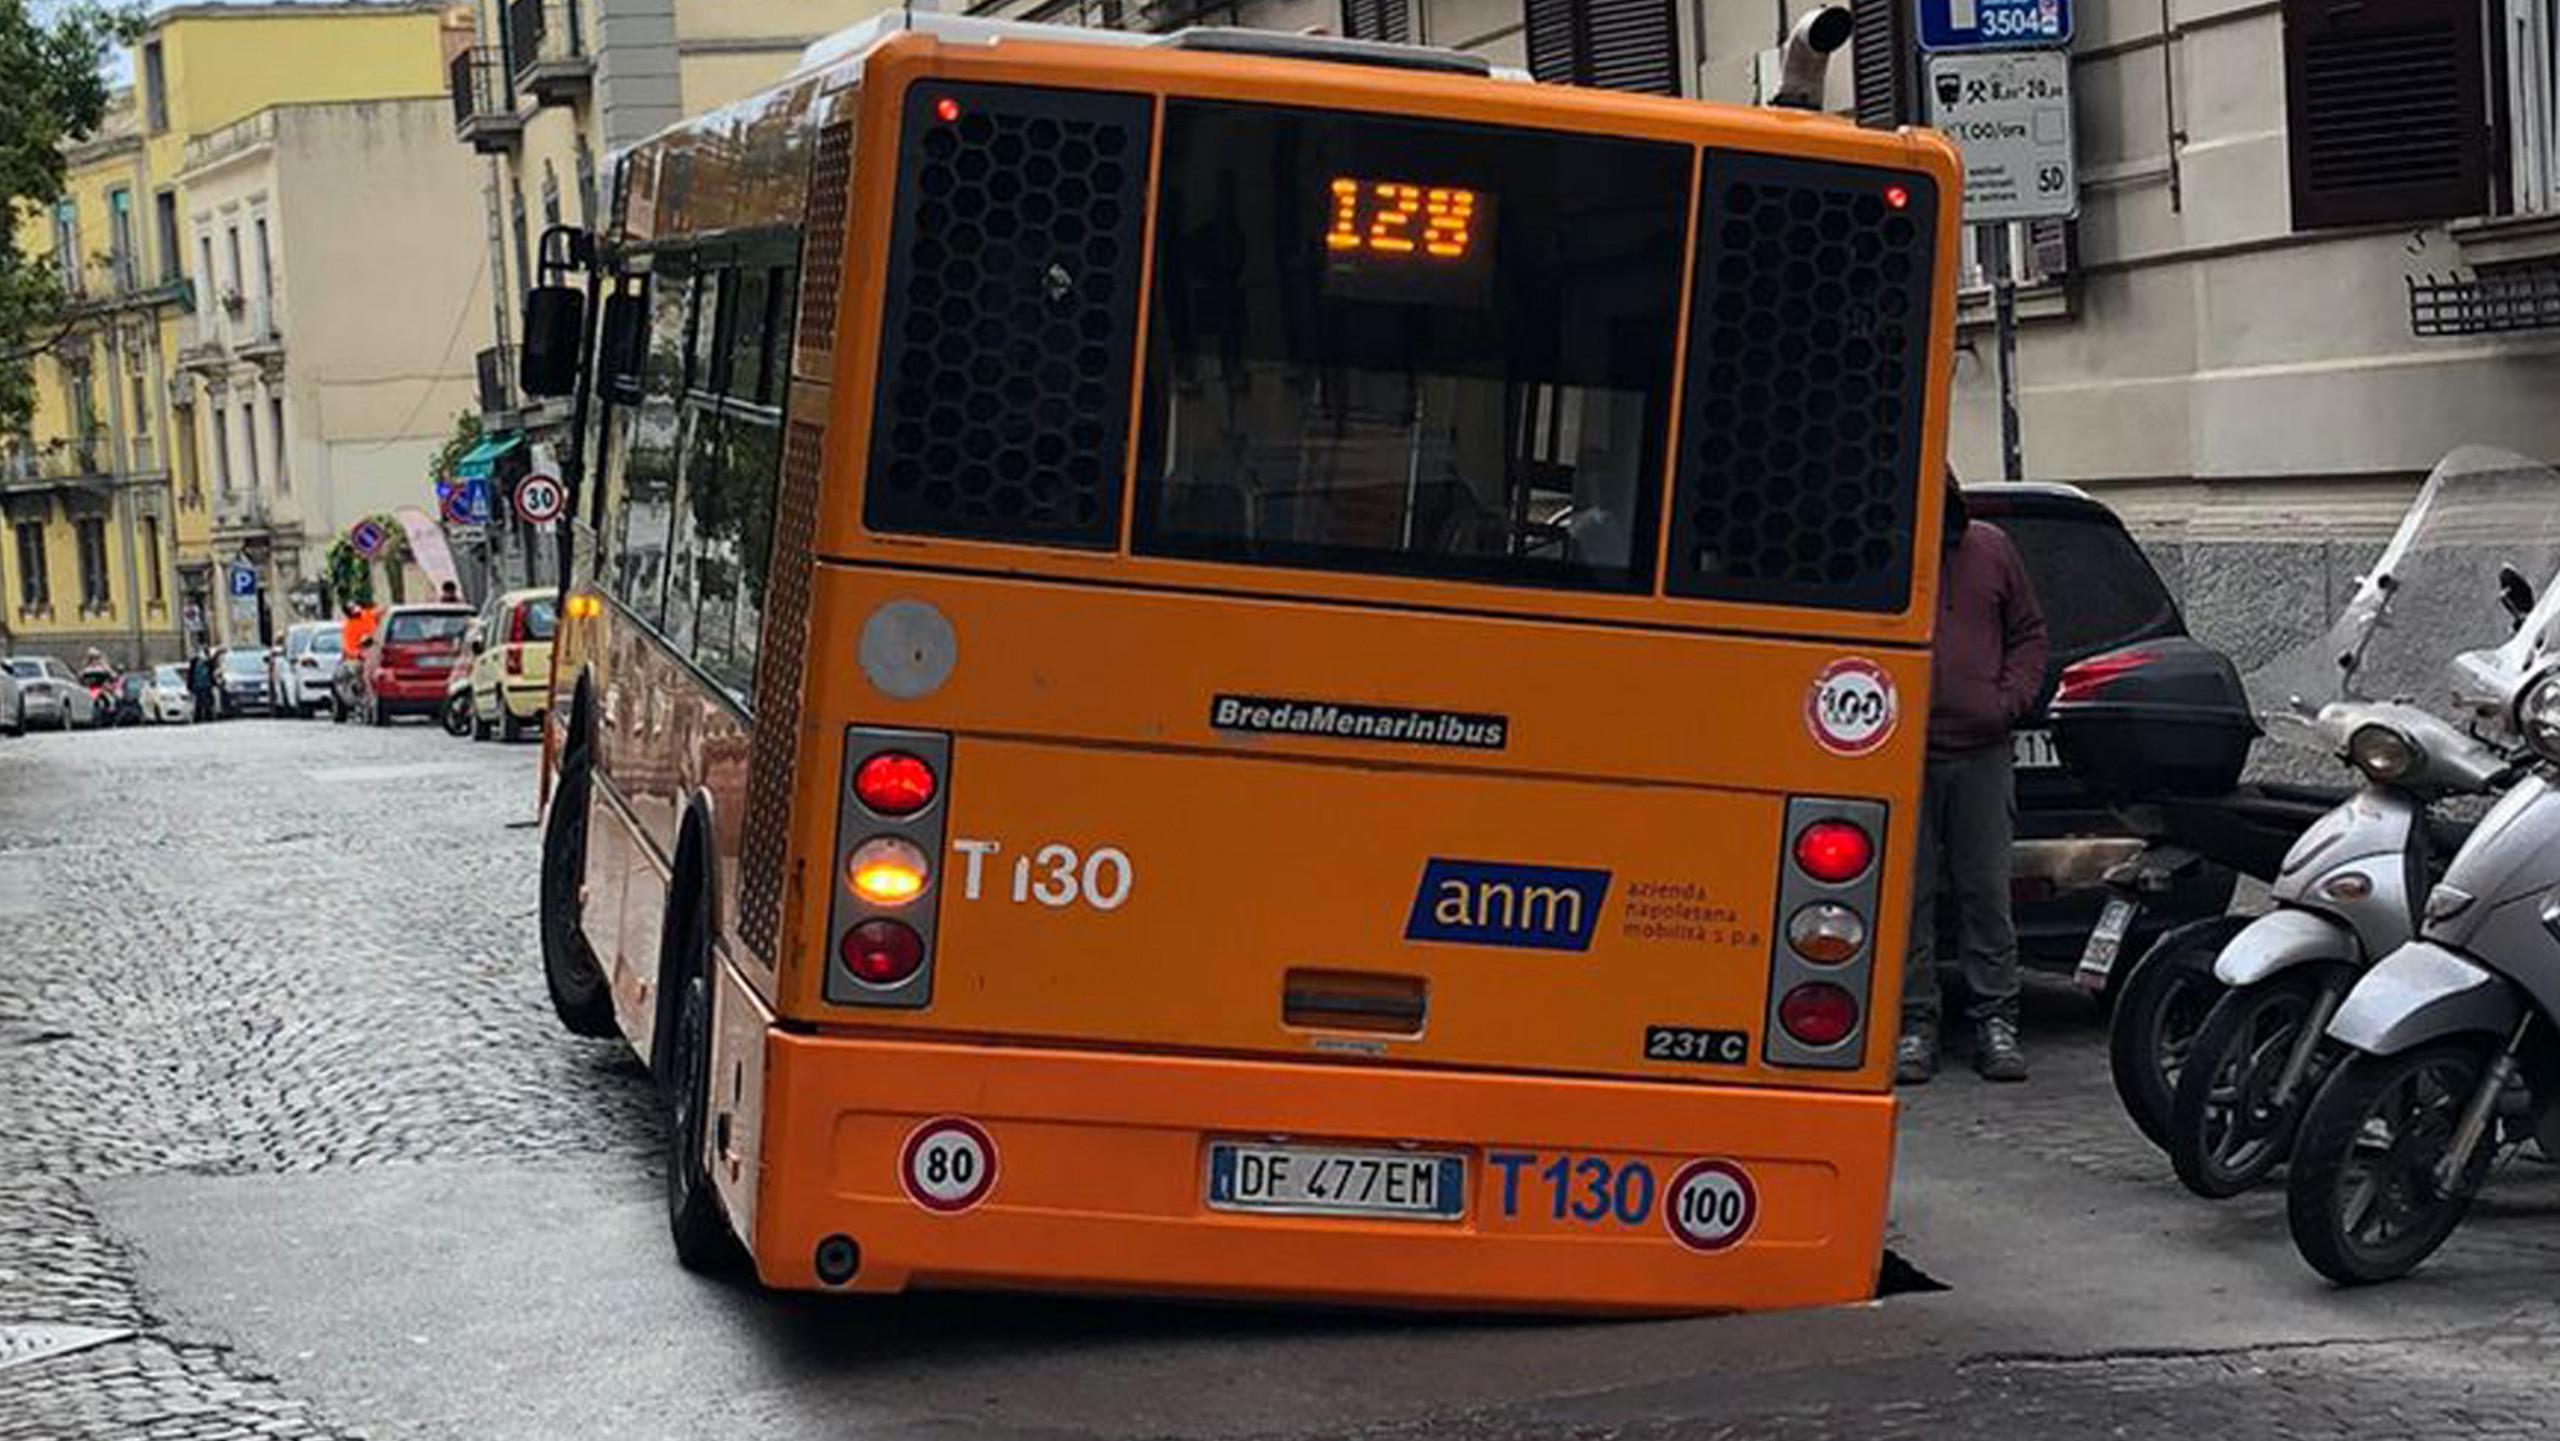 A Napoli autobus in voragine : Paura passeggeri